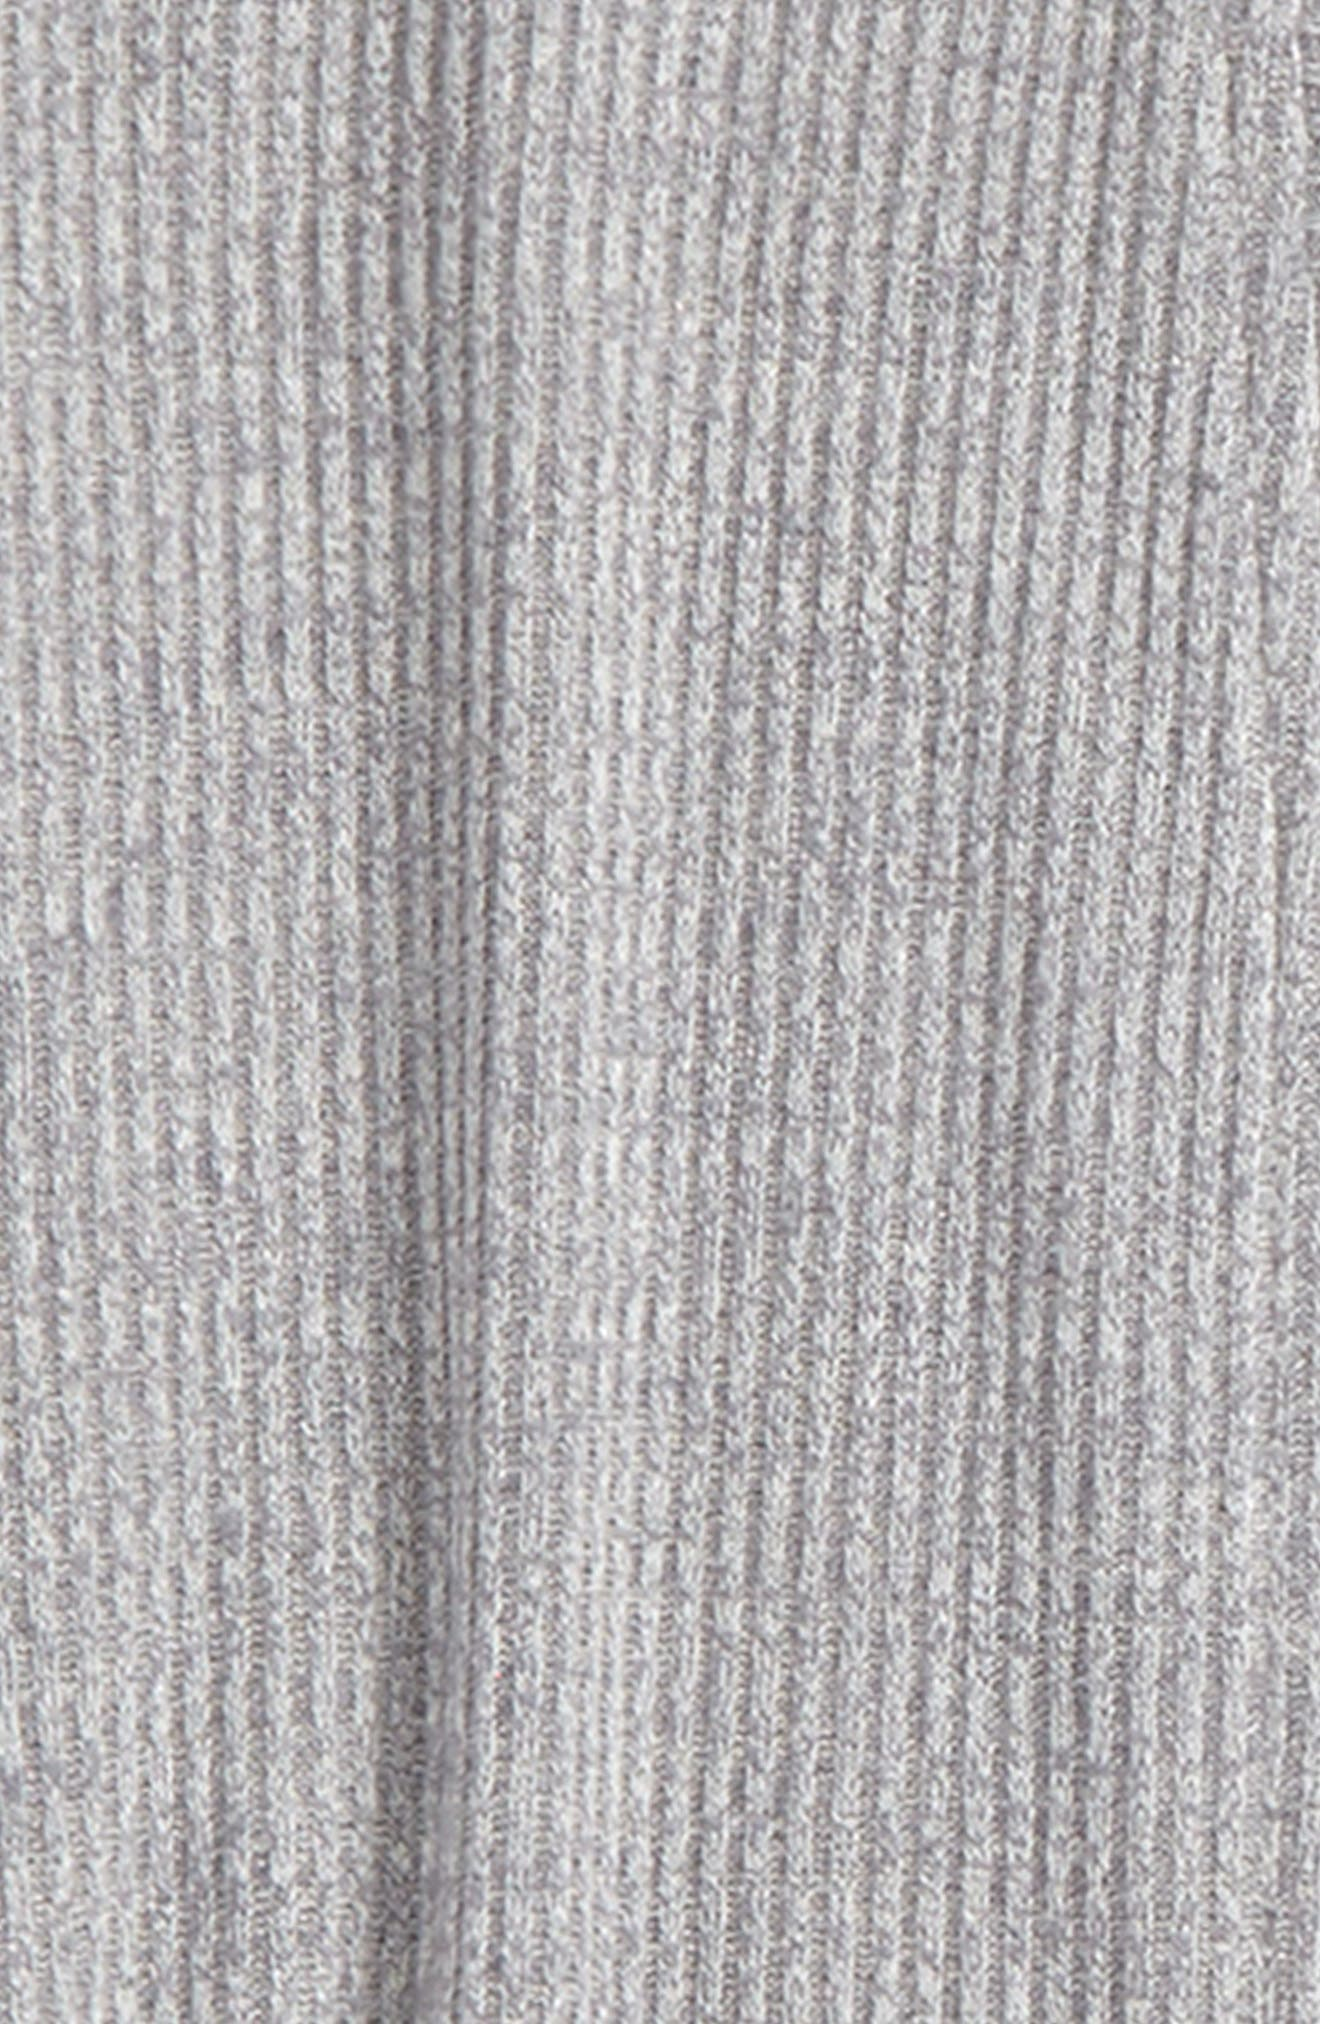 Blizzard Knit Hooded Cardigan,                             Alternate thumbnail 3, color,                             Zinc